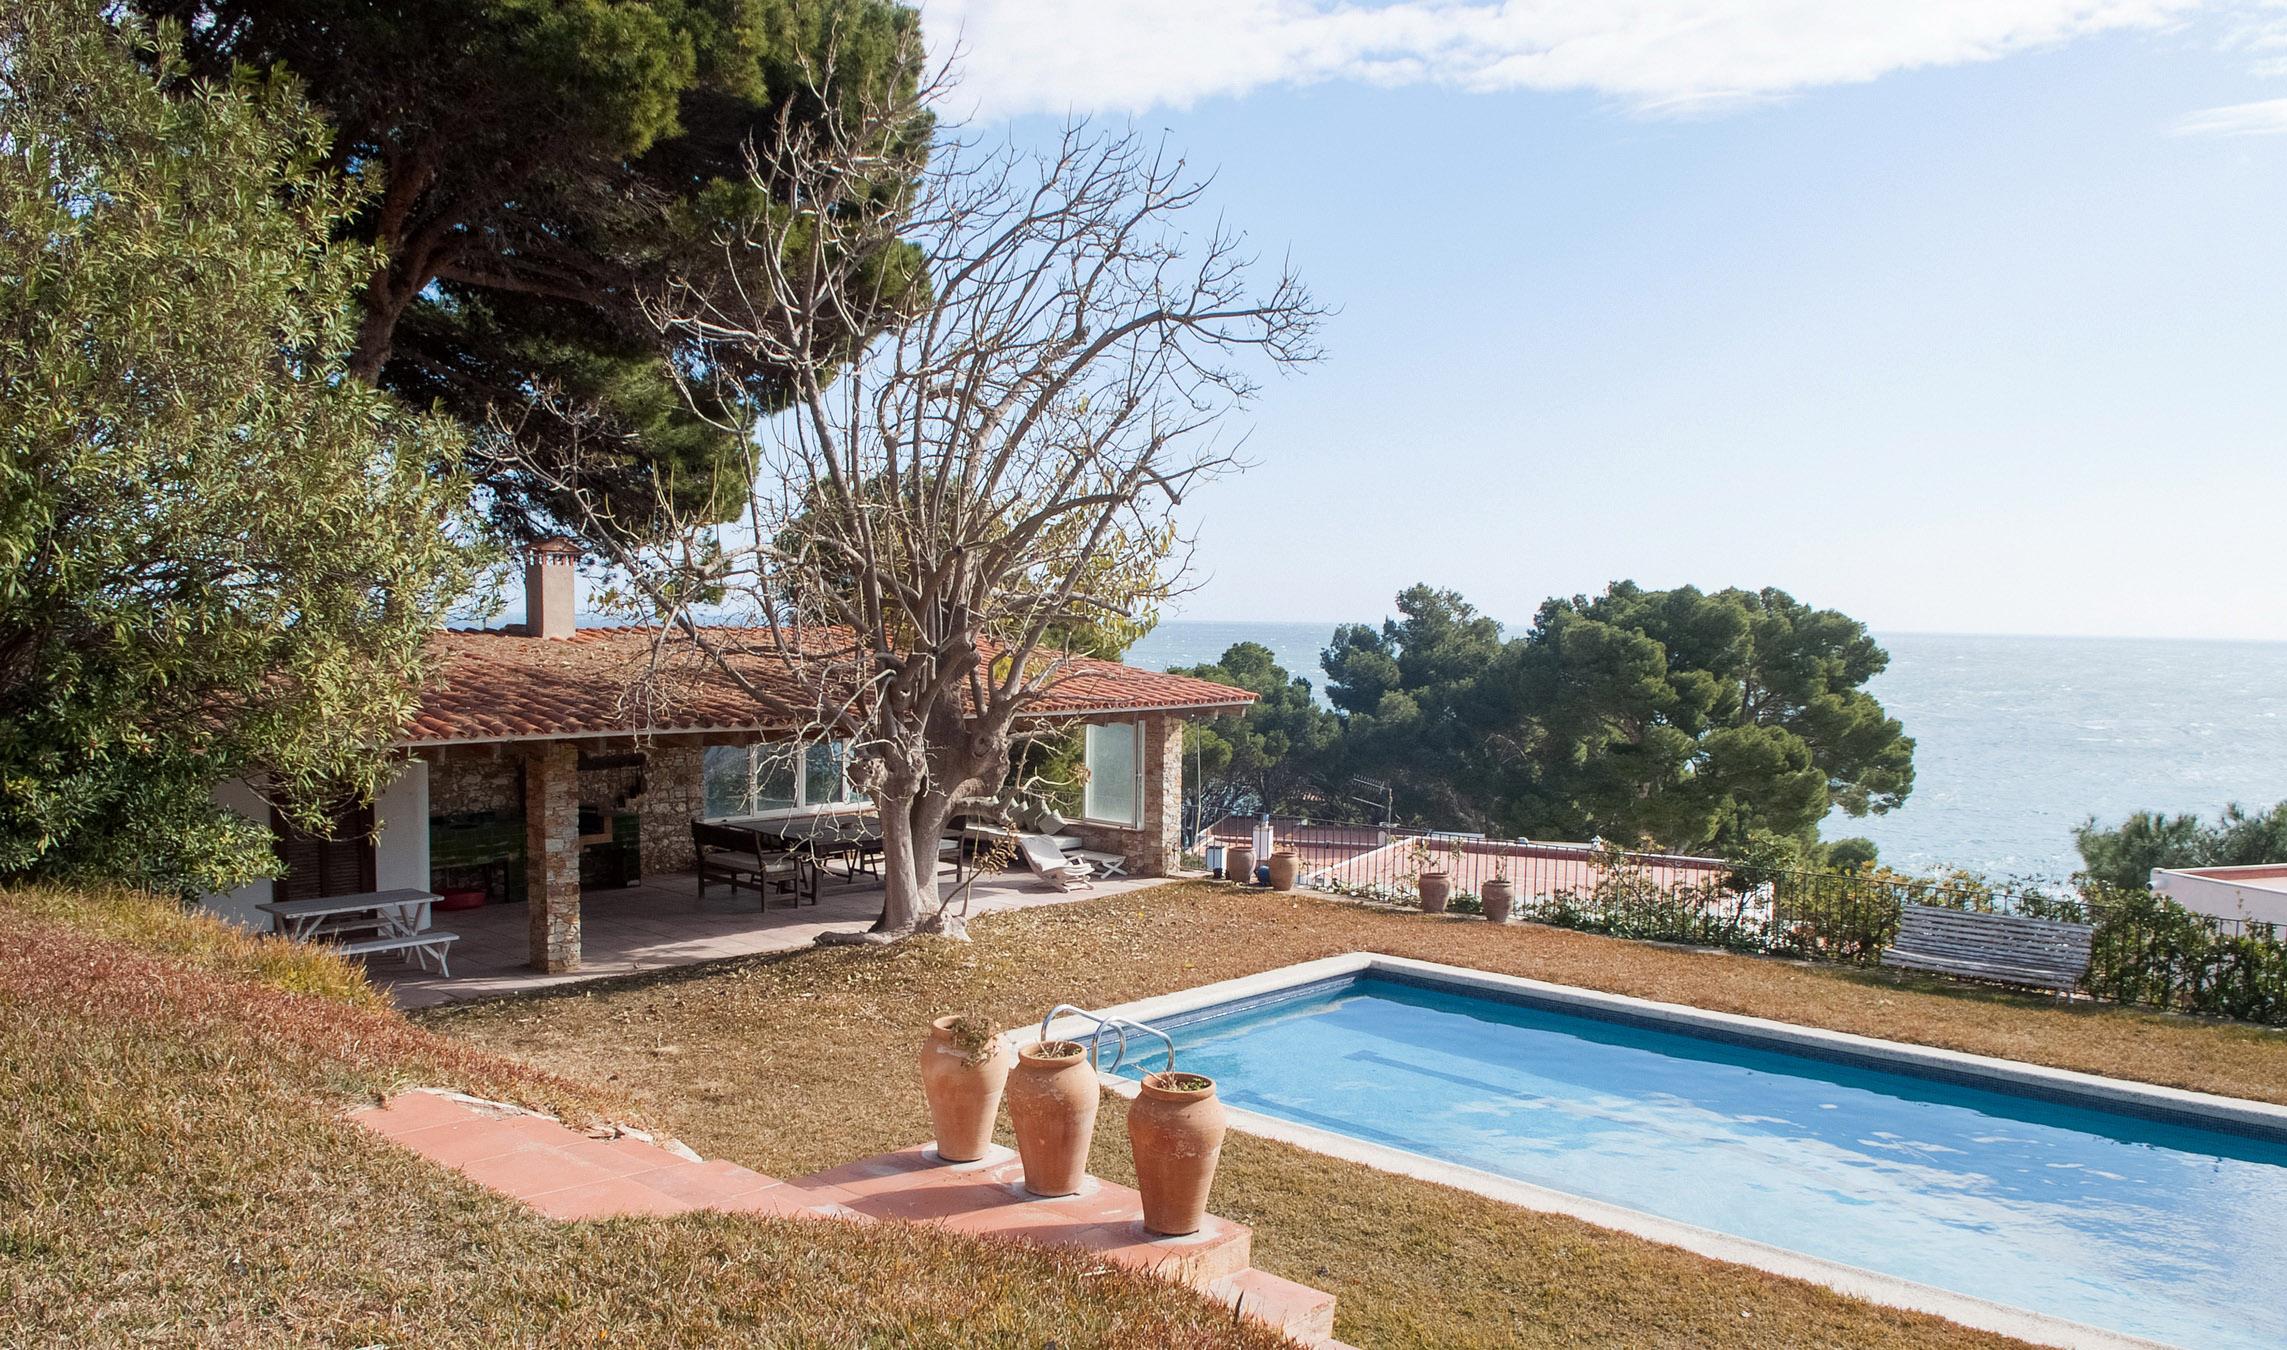 Vivienda unifamiliar por un Venta en House in front of the sea with beach access on large plot Begur, Costa Brava 17255 España